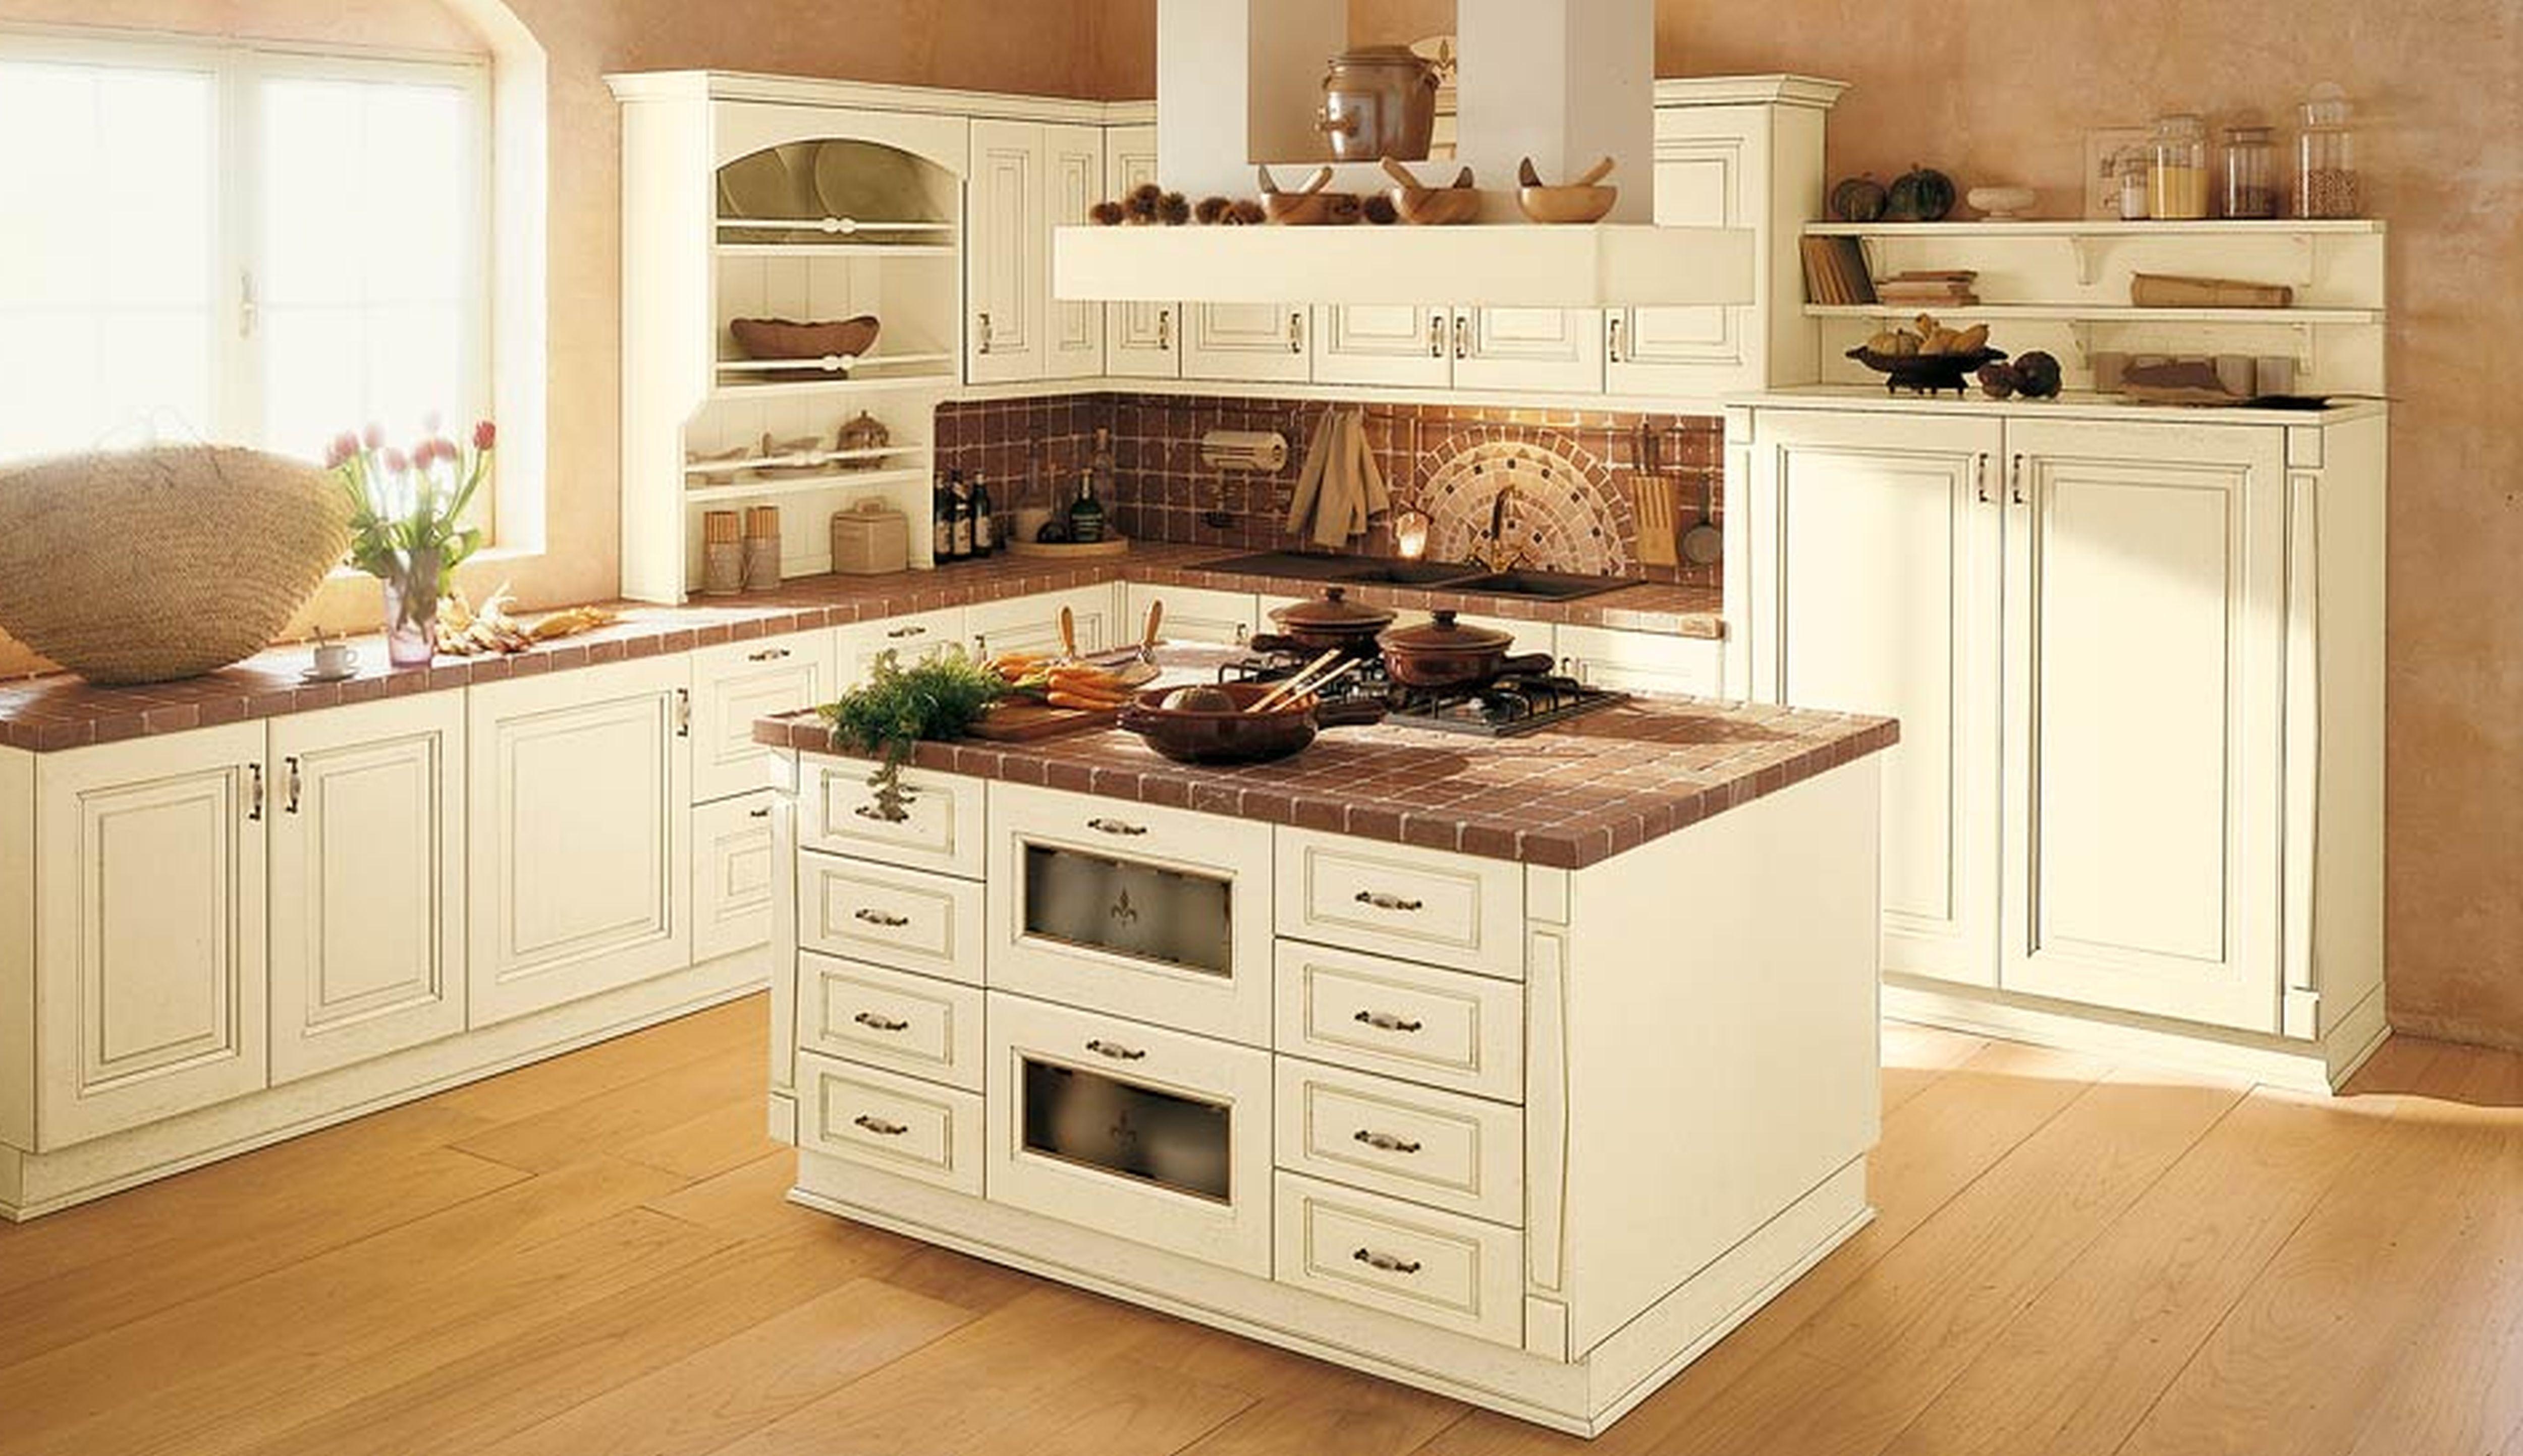 Hardwood Floor Stapler Rental Cost Of the Wood Maker Page 6 Wood Wallpaper within Kitchen Remodeling Ideas Inspirationa Kitchen Designing 0d Inspirations Of Wood Floor Designs